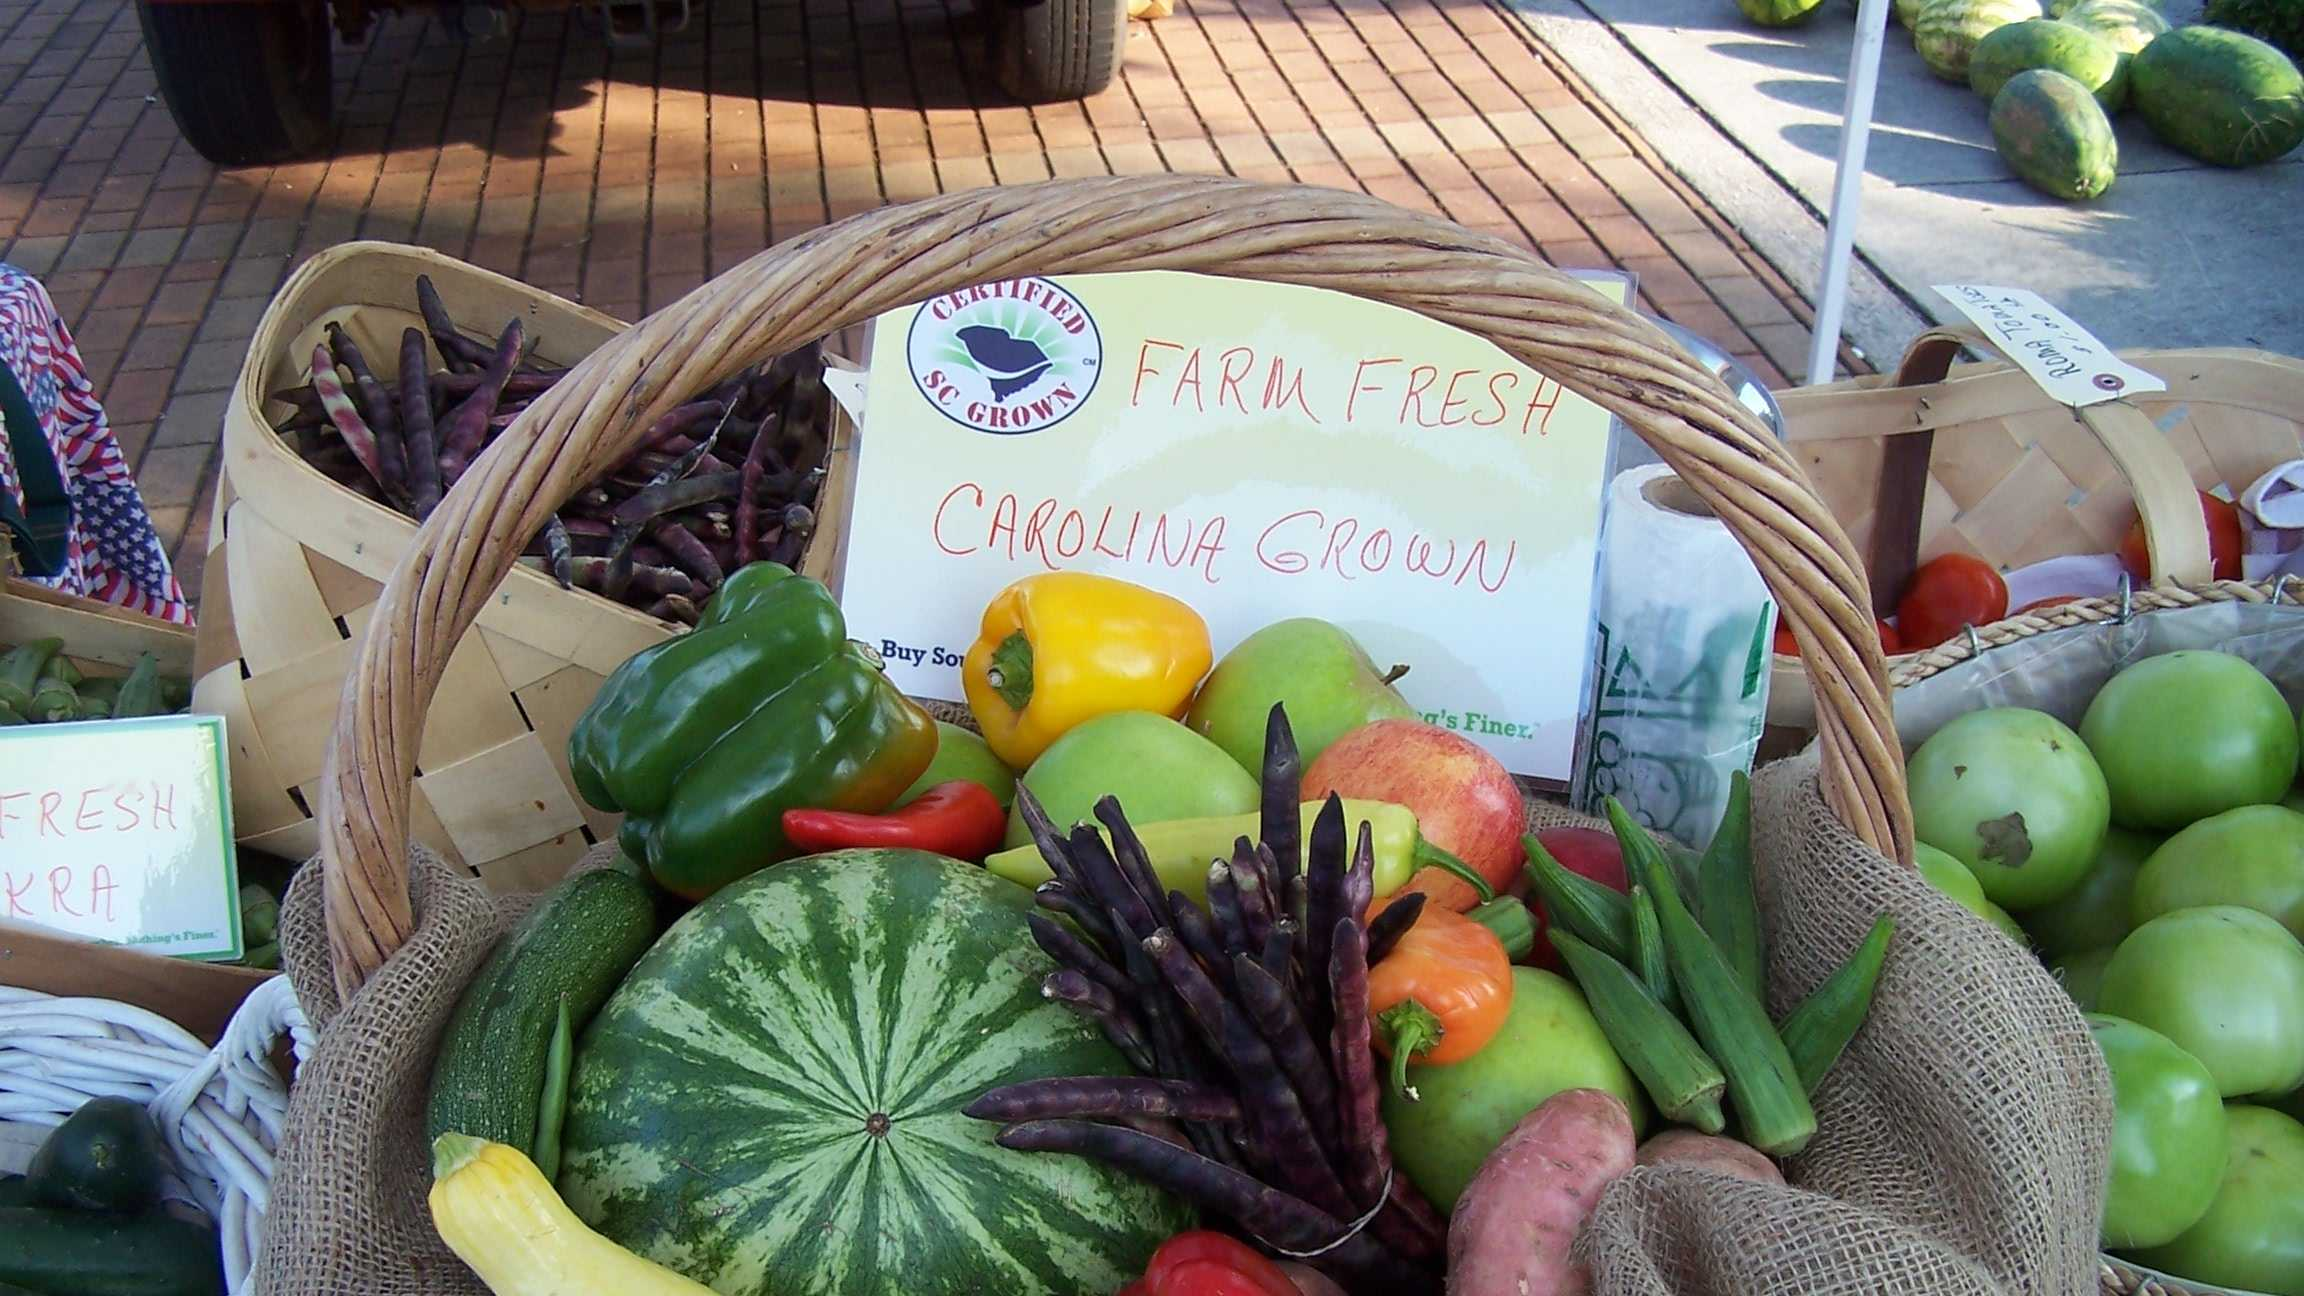 Image from HubCityFM.org http://www.hubcityfm.org/seasonal-eating/